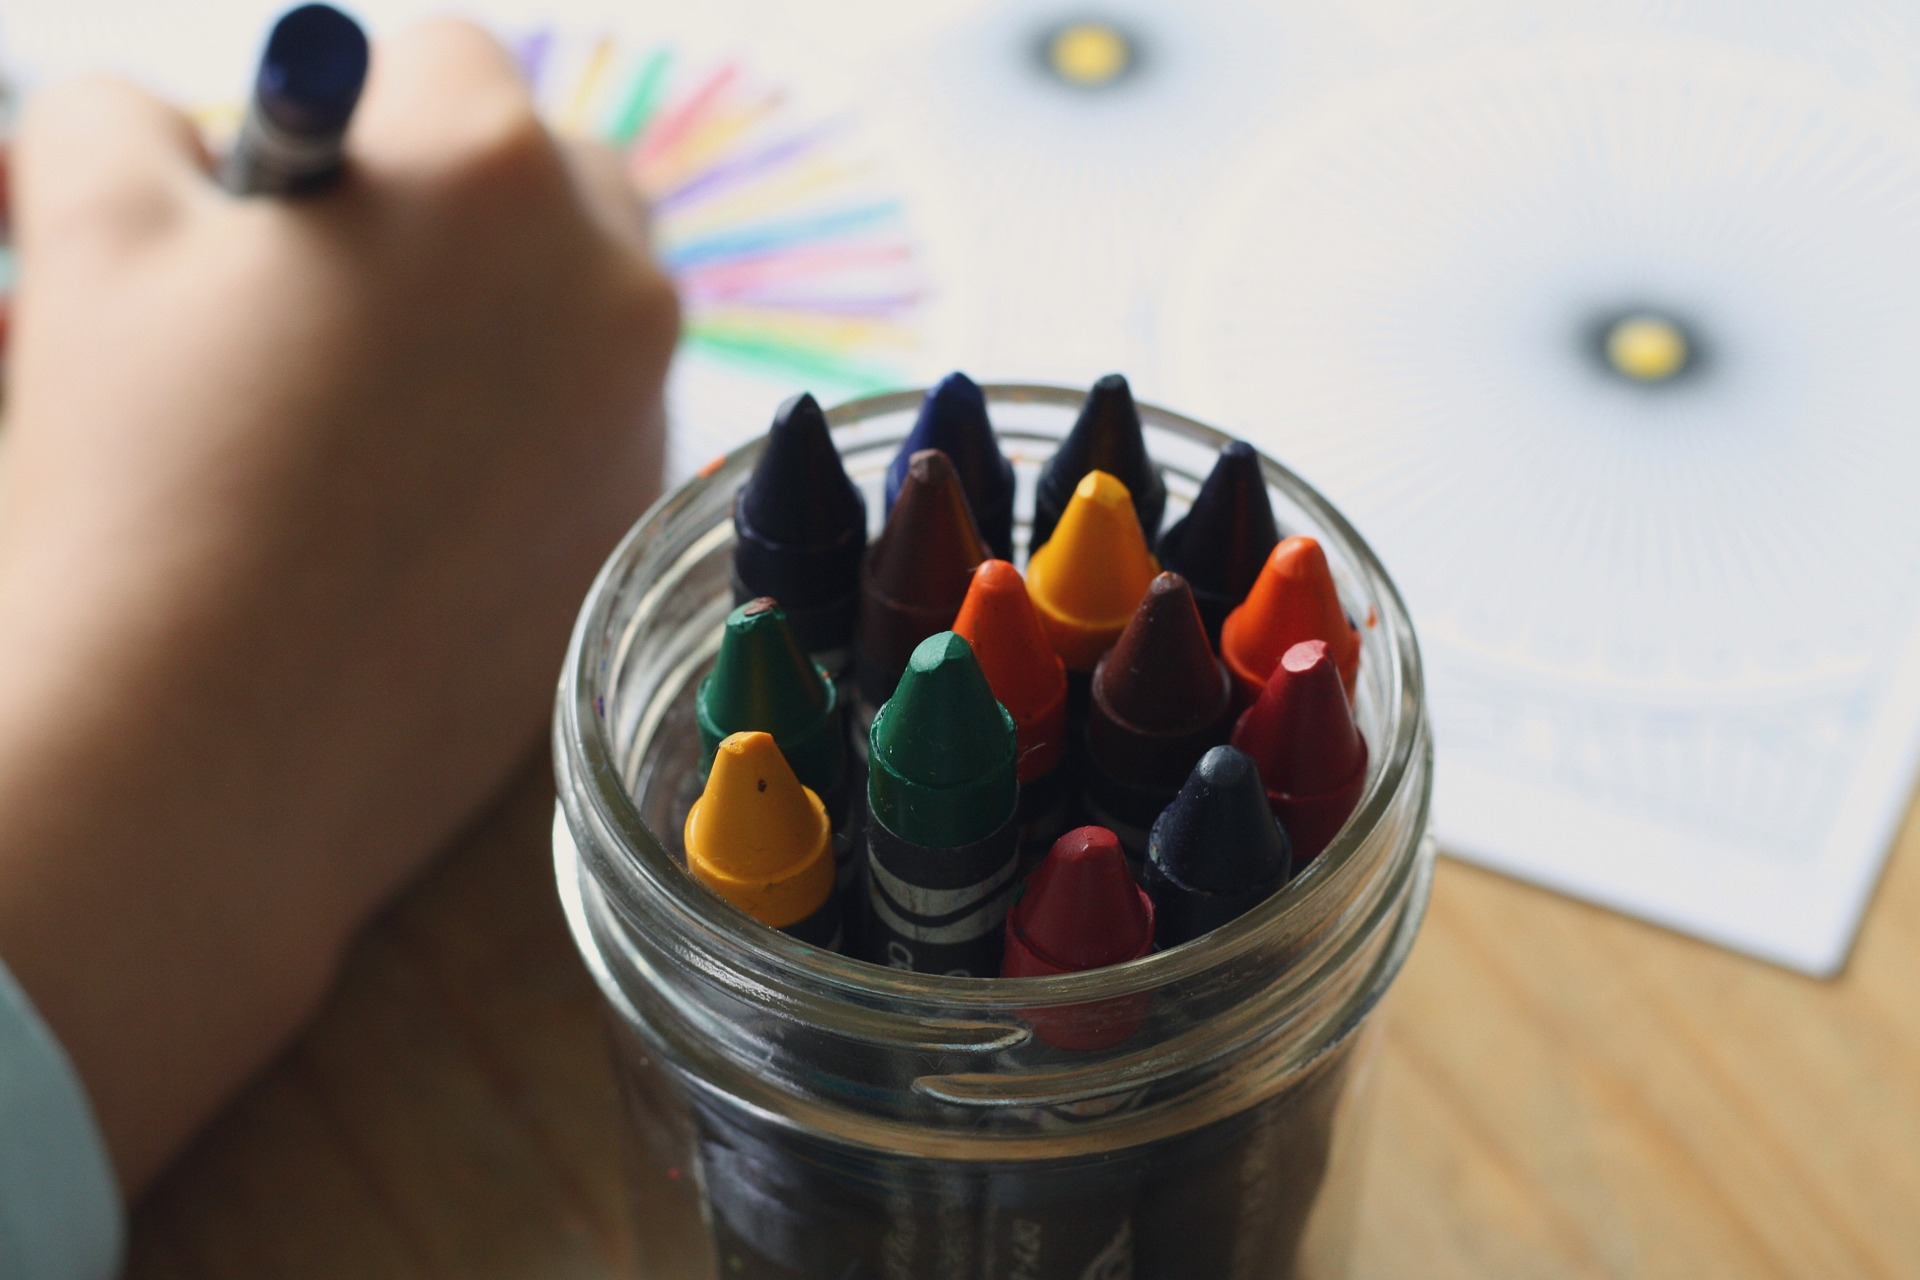 crayons-1445054_1920.jpg